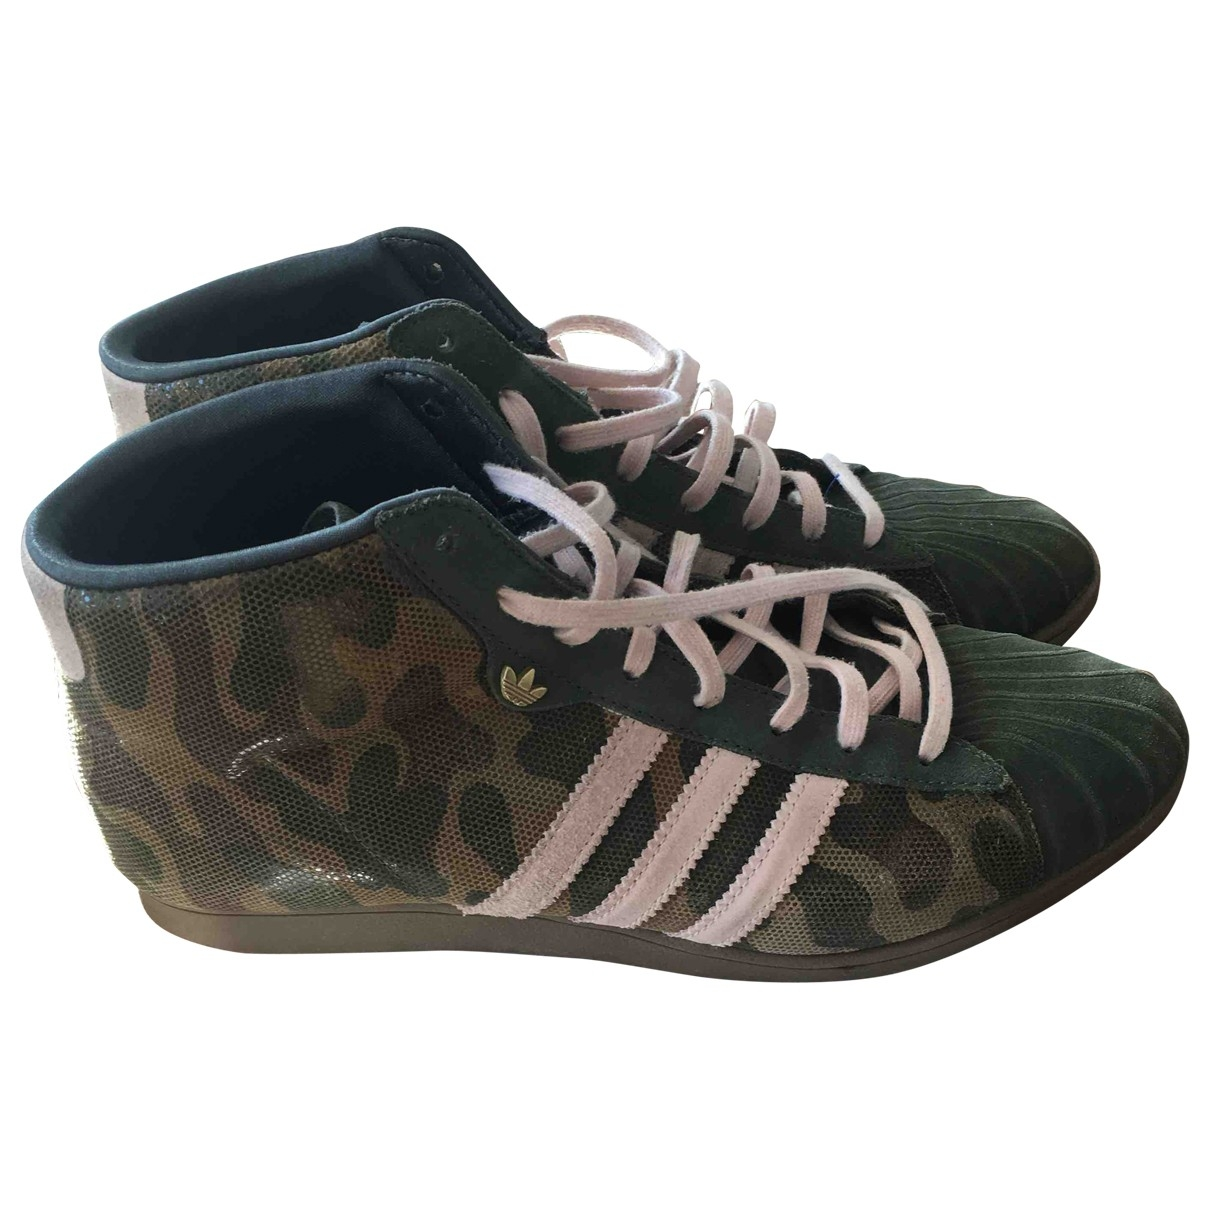 Adidas \N Khaki Leather Trainers for Women 41 EU